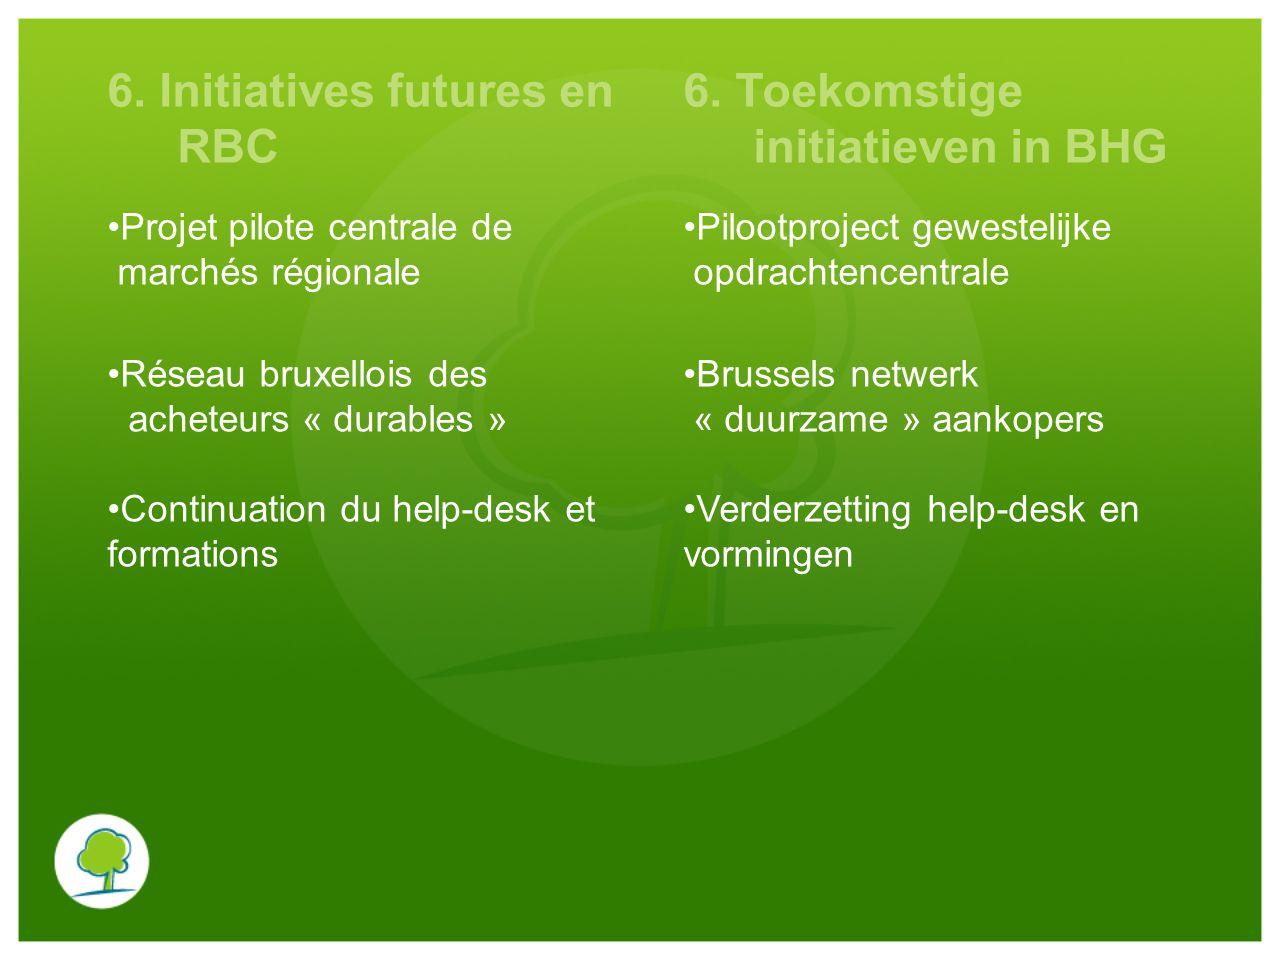 6. Initiatives futures en RBC 6. Toekomstige initiatieven in BHG Projet pilote centrale de marchés régionale Pilootproject gewestelijke opdrachtencent